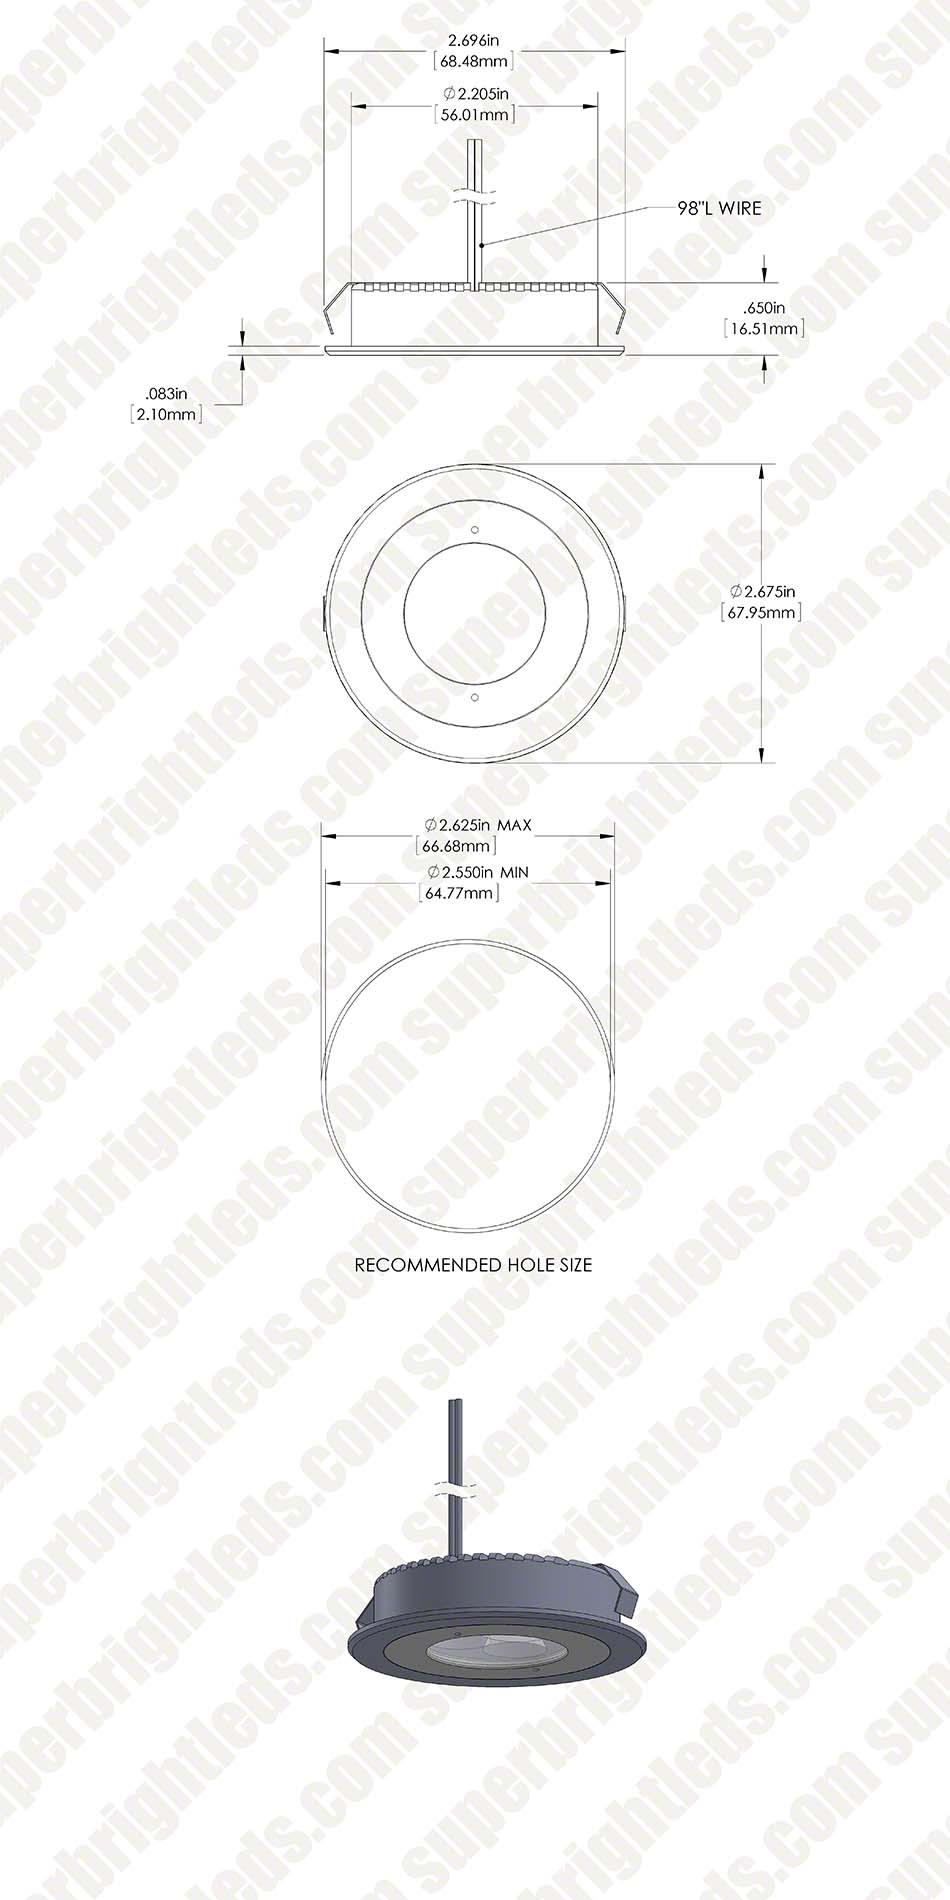 Led Recessed Light Fixture 25 Watt Equivalent 235 Lumens Super Cree Lighting Wiring Diagram 3 Xpe